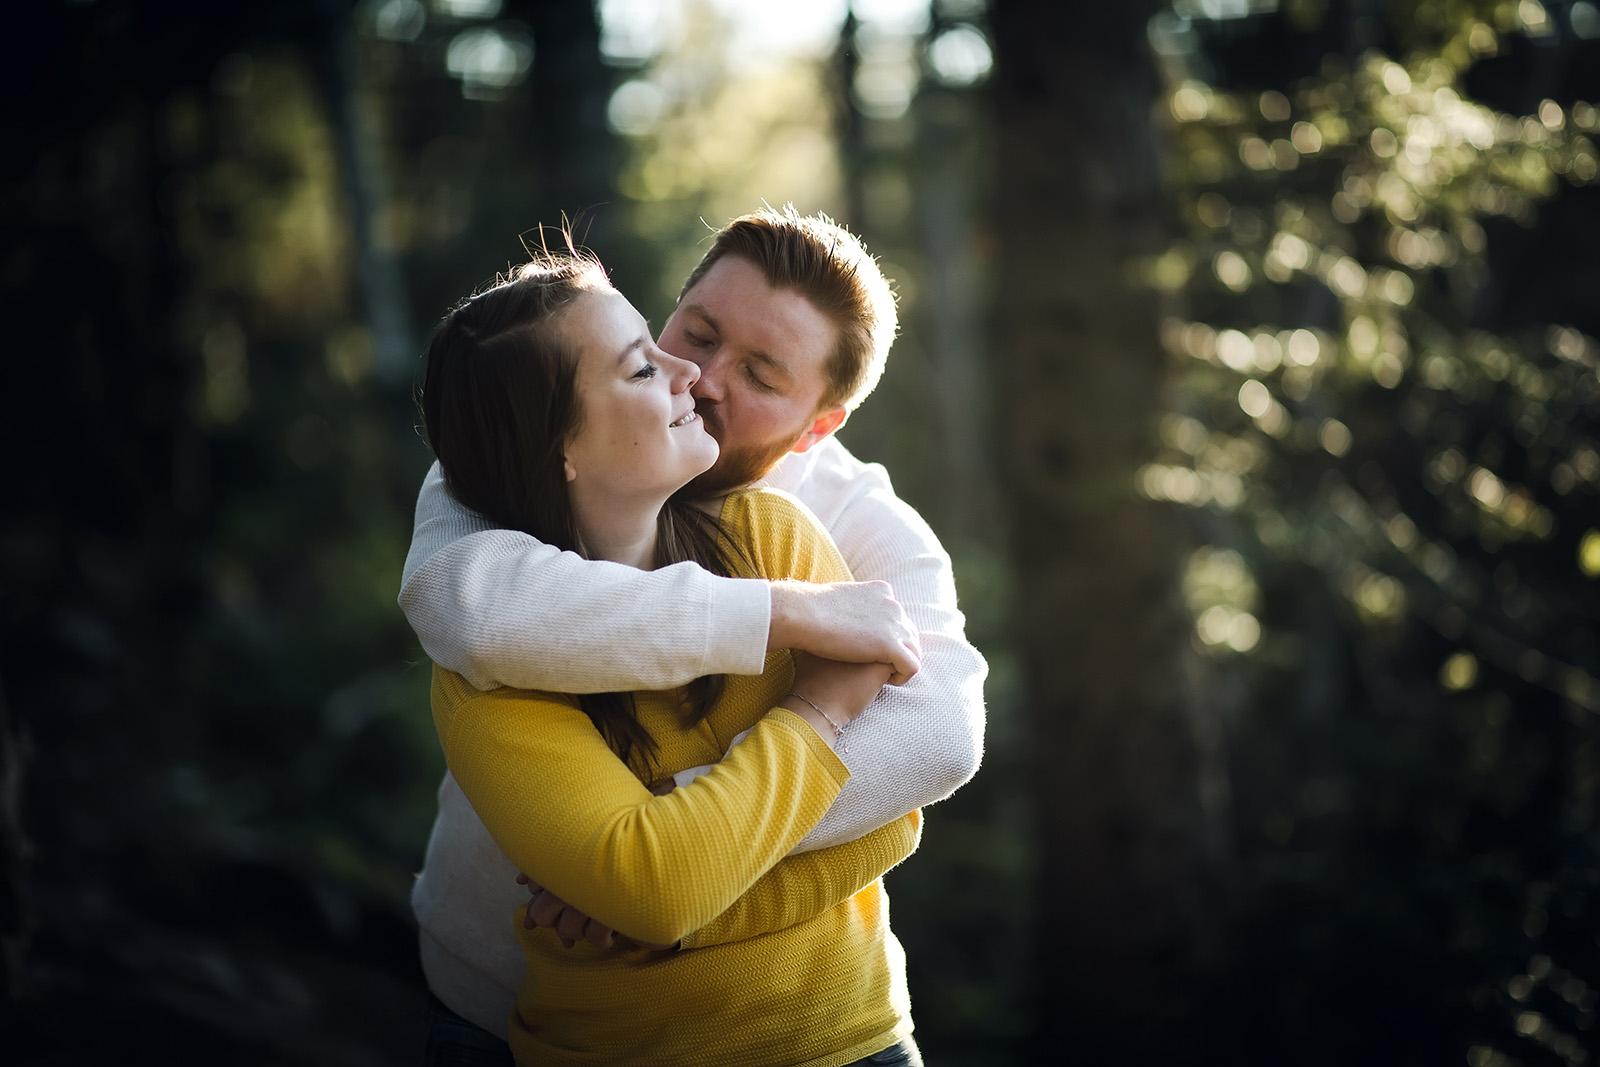 seance-photo-couple-engagement-grenoble-isere-montagne-chartreuse-vercors-elise-julliard-photographe-portrait-16